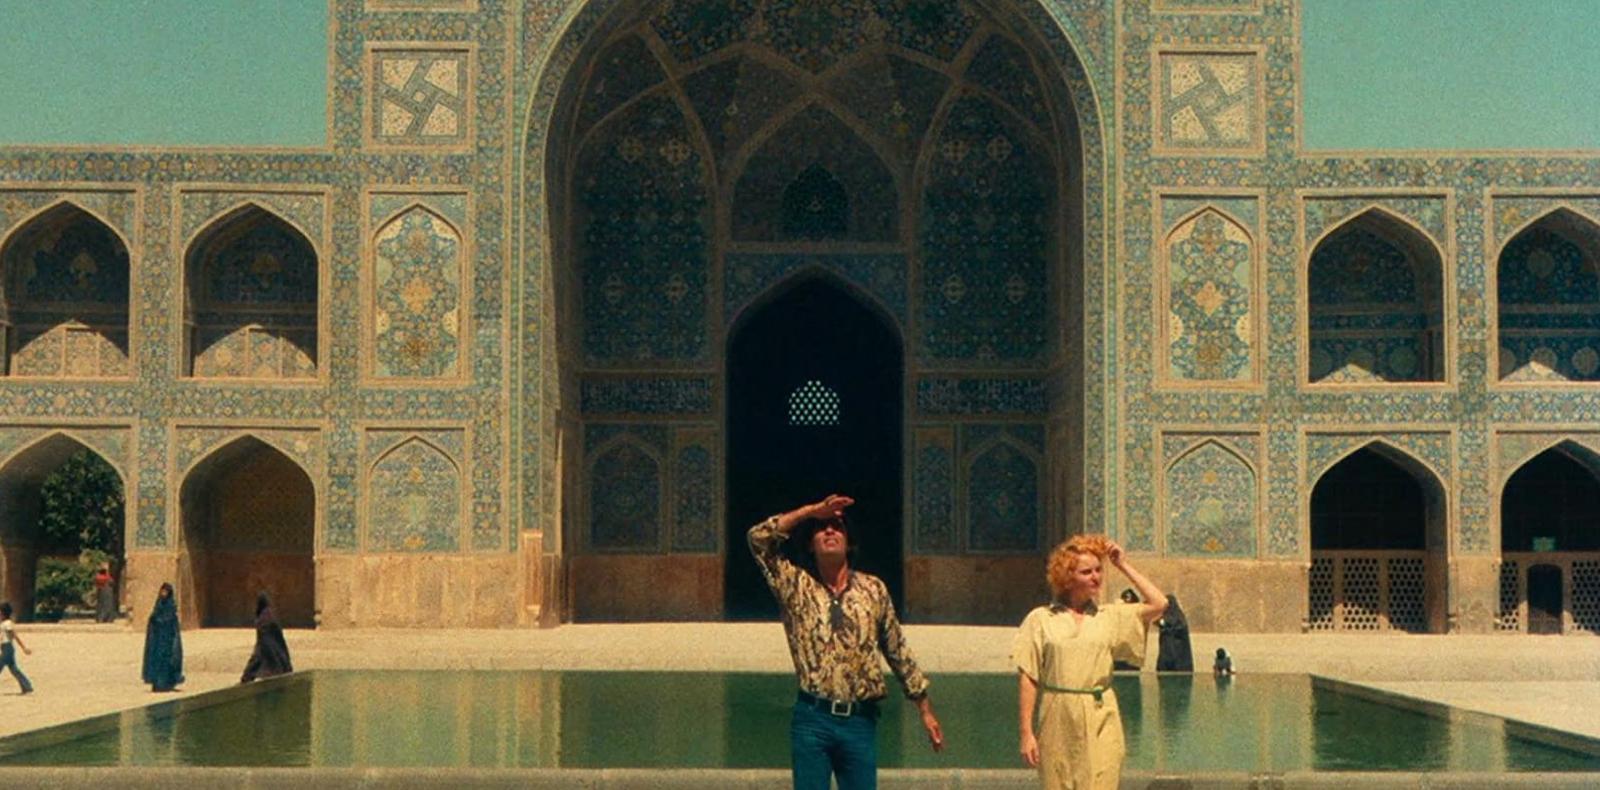 Plaisir d'amour en Iran © Agnès Varda